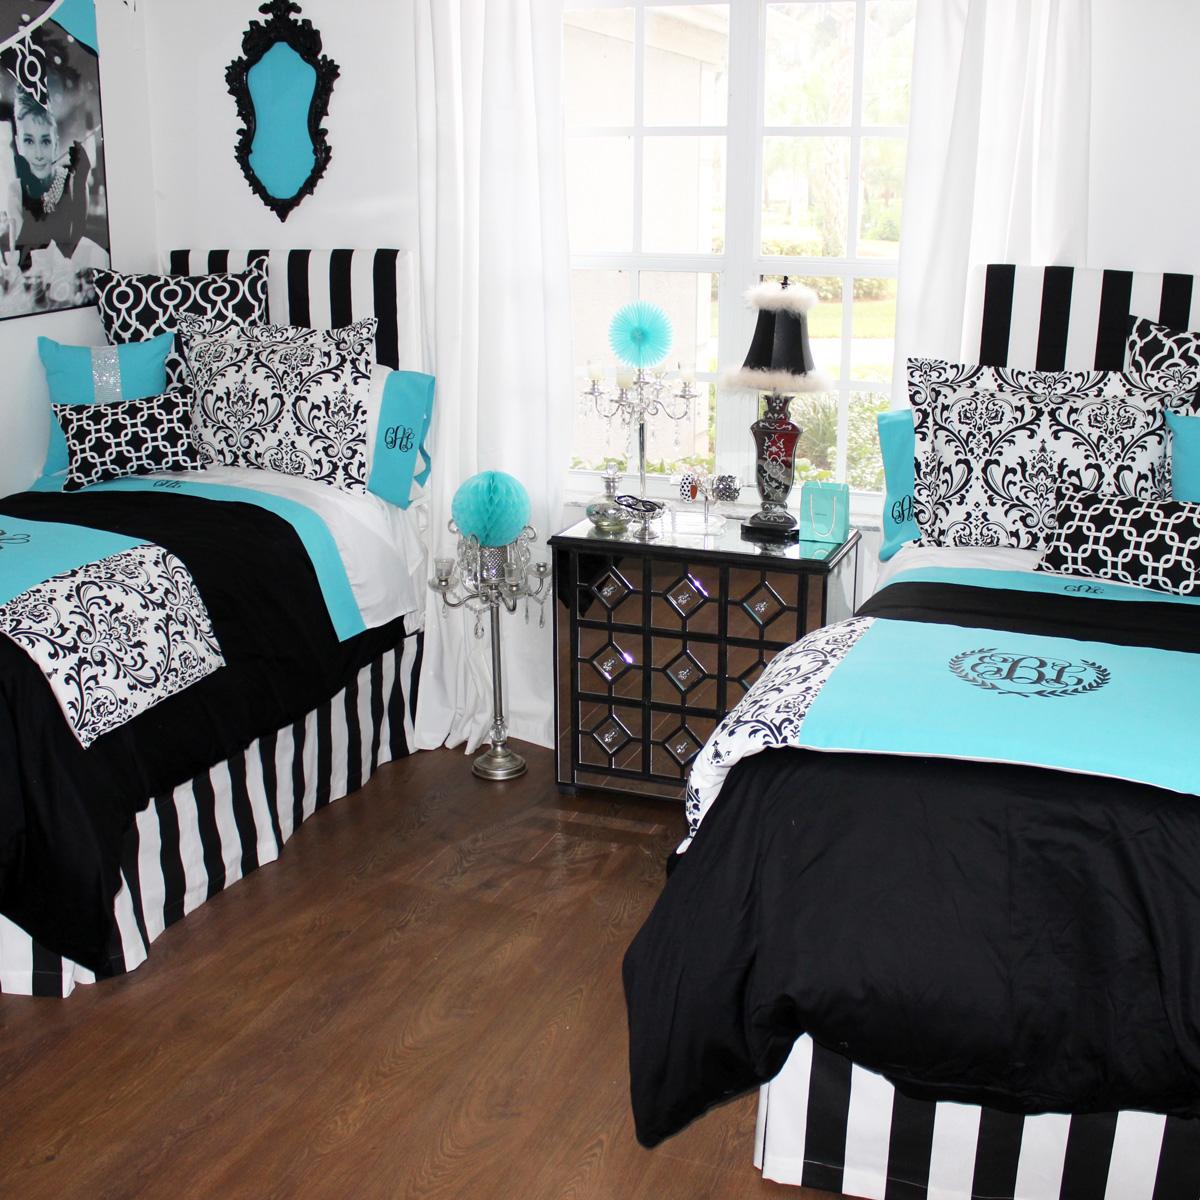 Tiffany Blue and Black Bedding